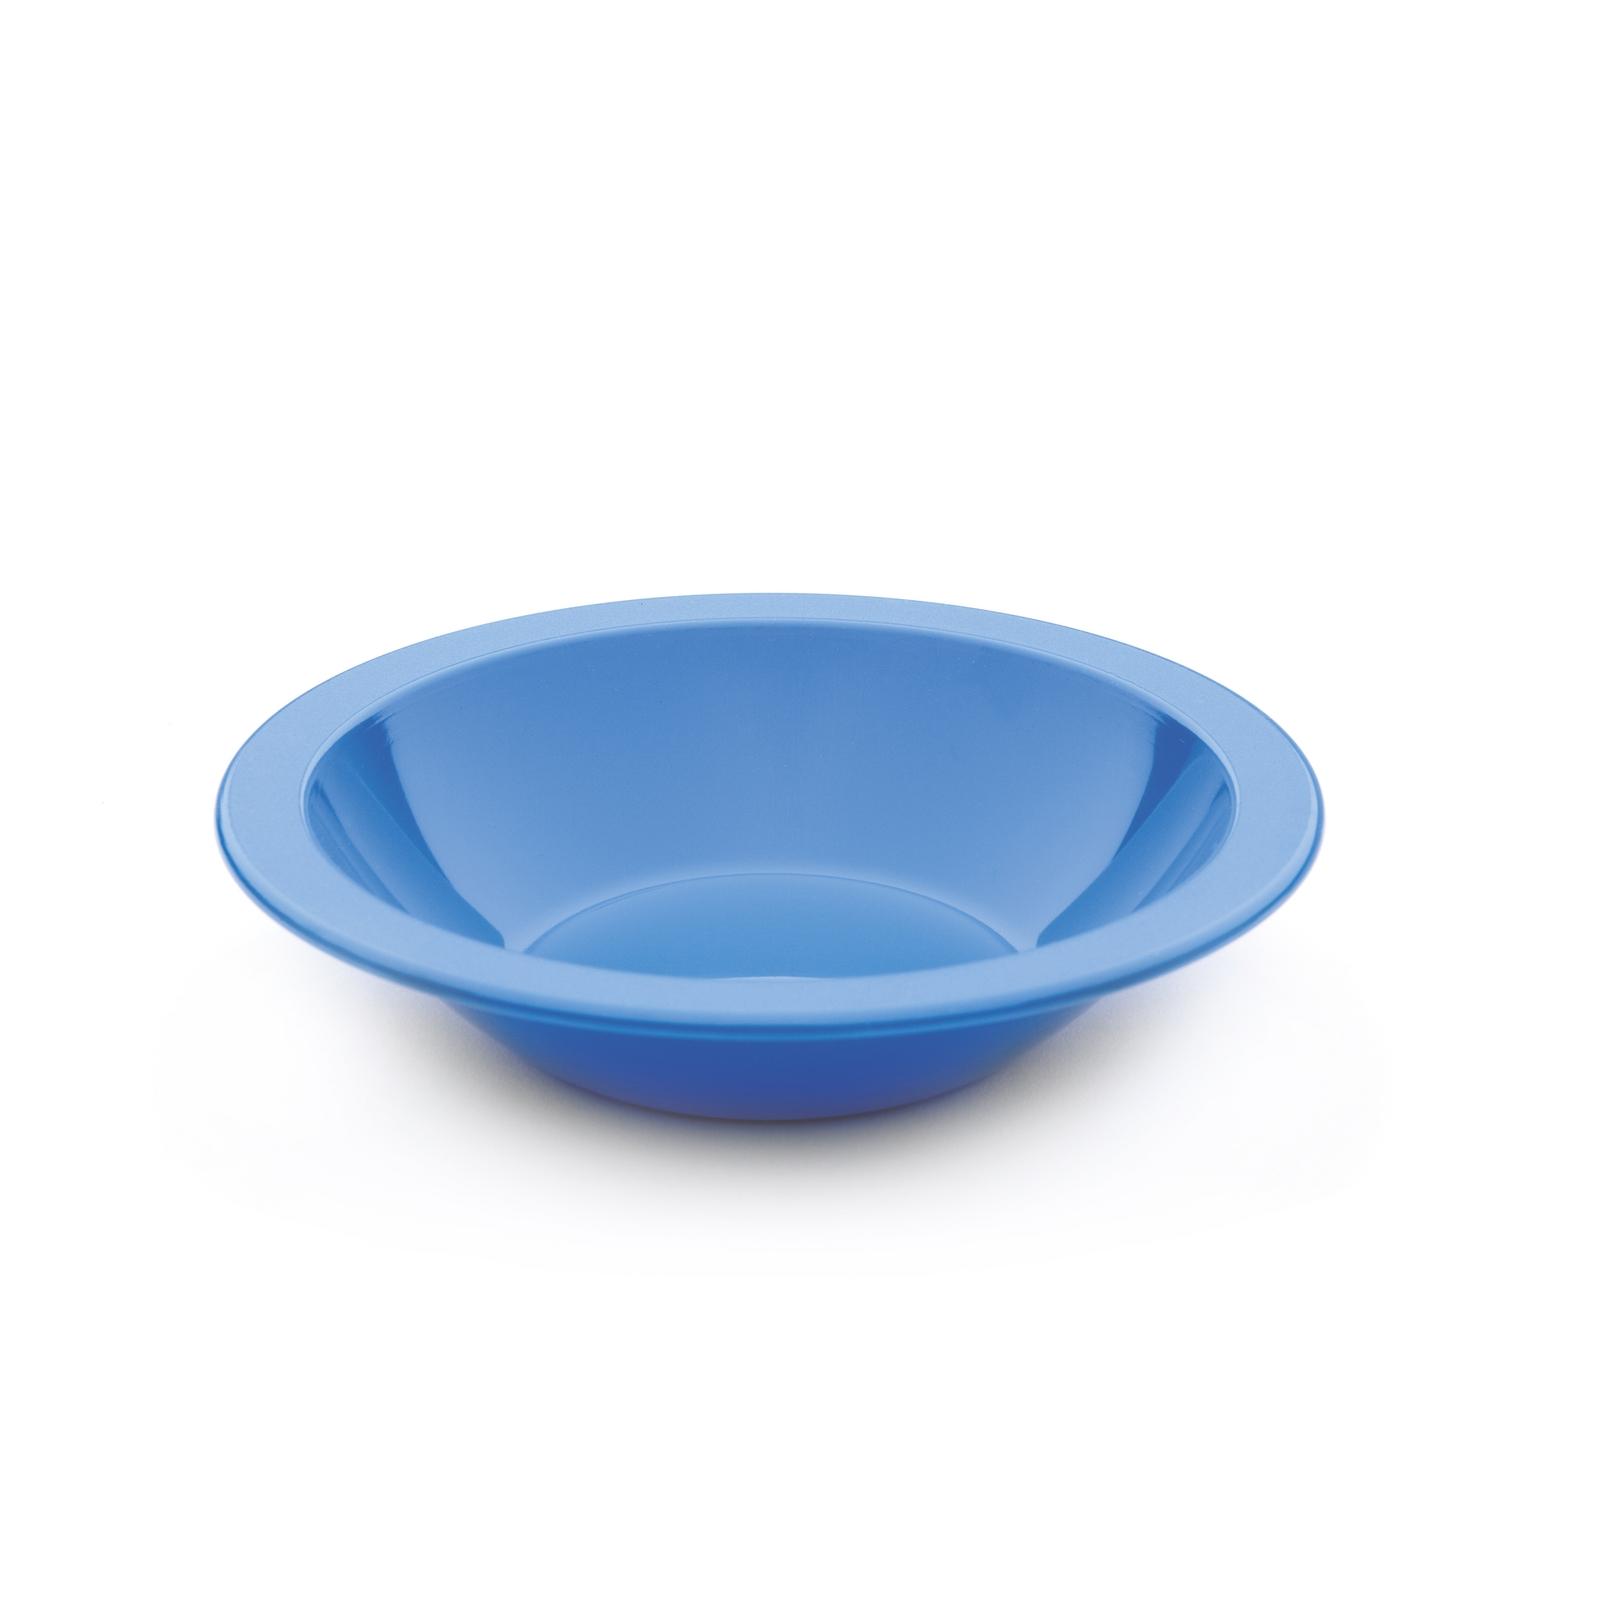 Polycarb Rimmed Bowls 170mm - Blue